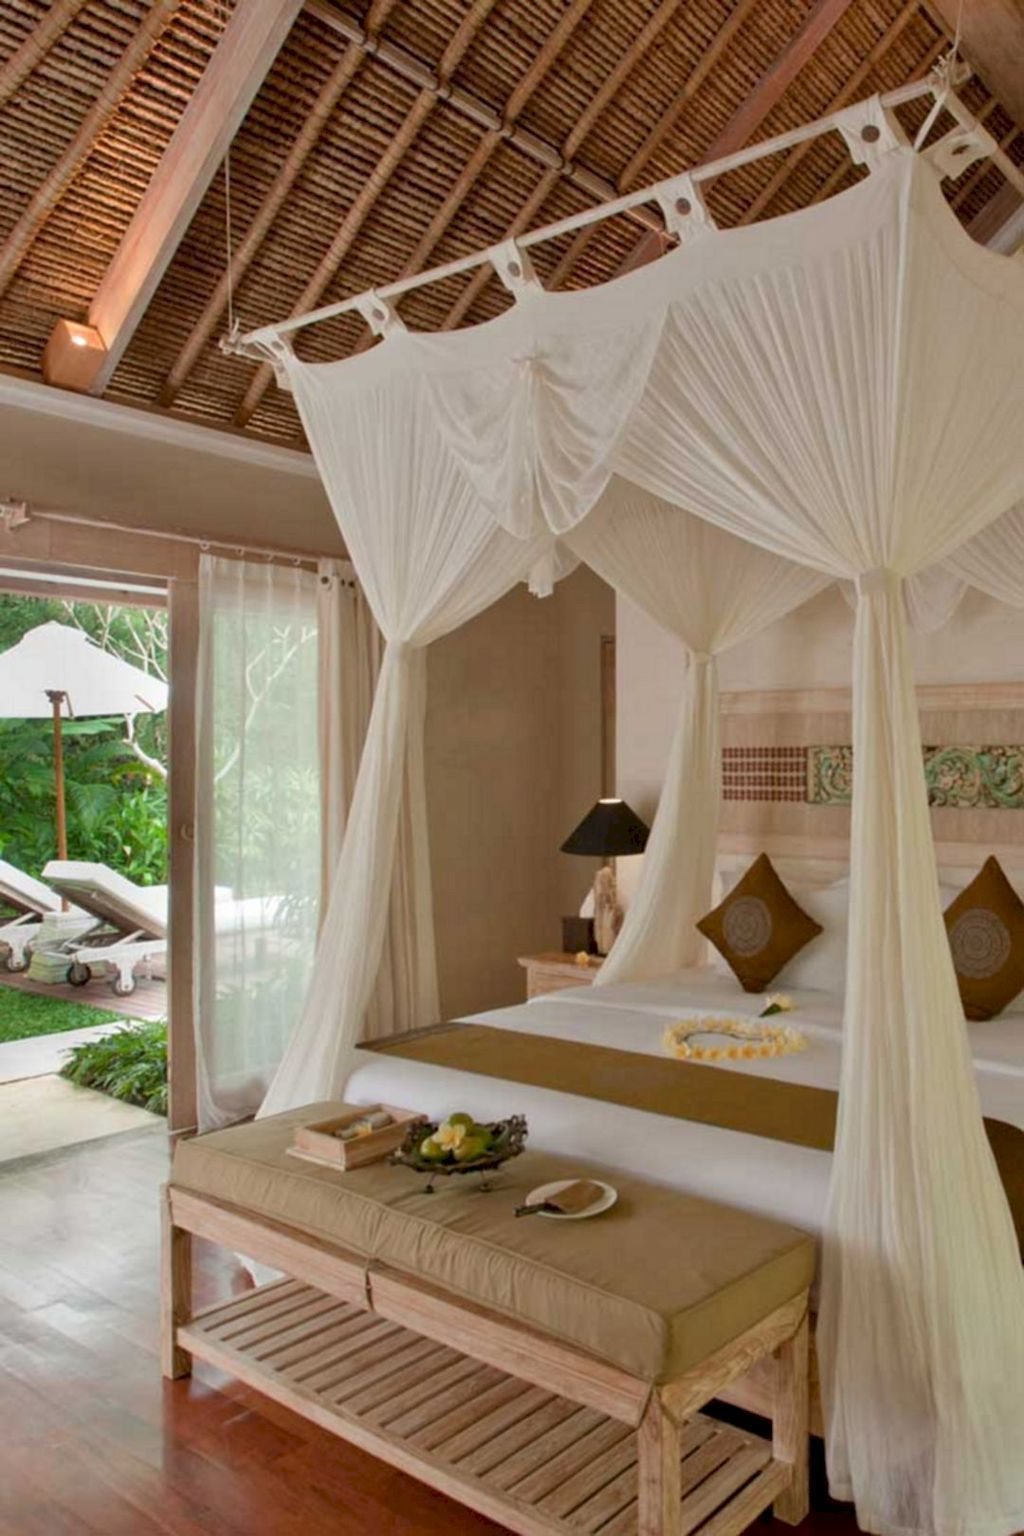 romantic shabby chic bedroom decorating ideas 37 on romantic trend master bedroom ideas id=92397